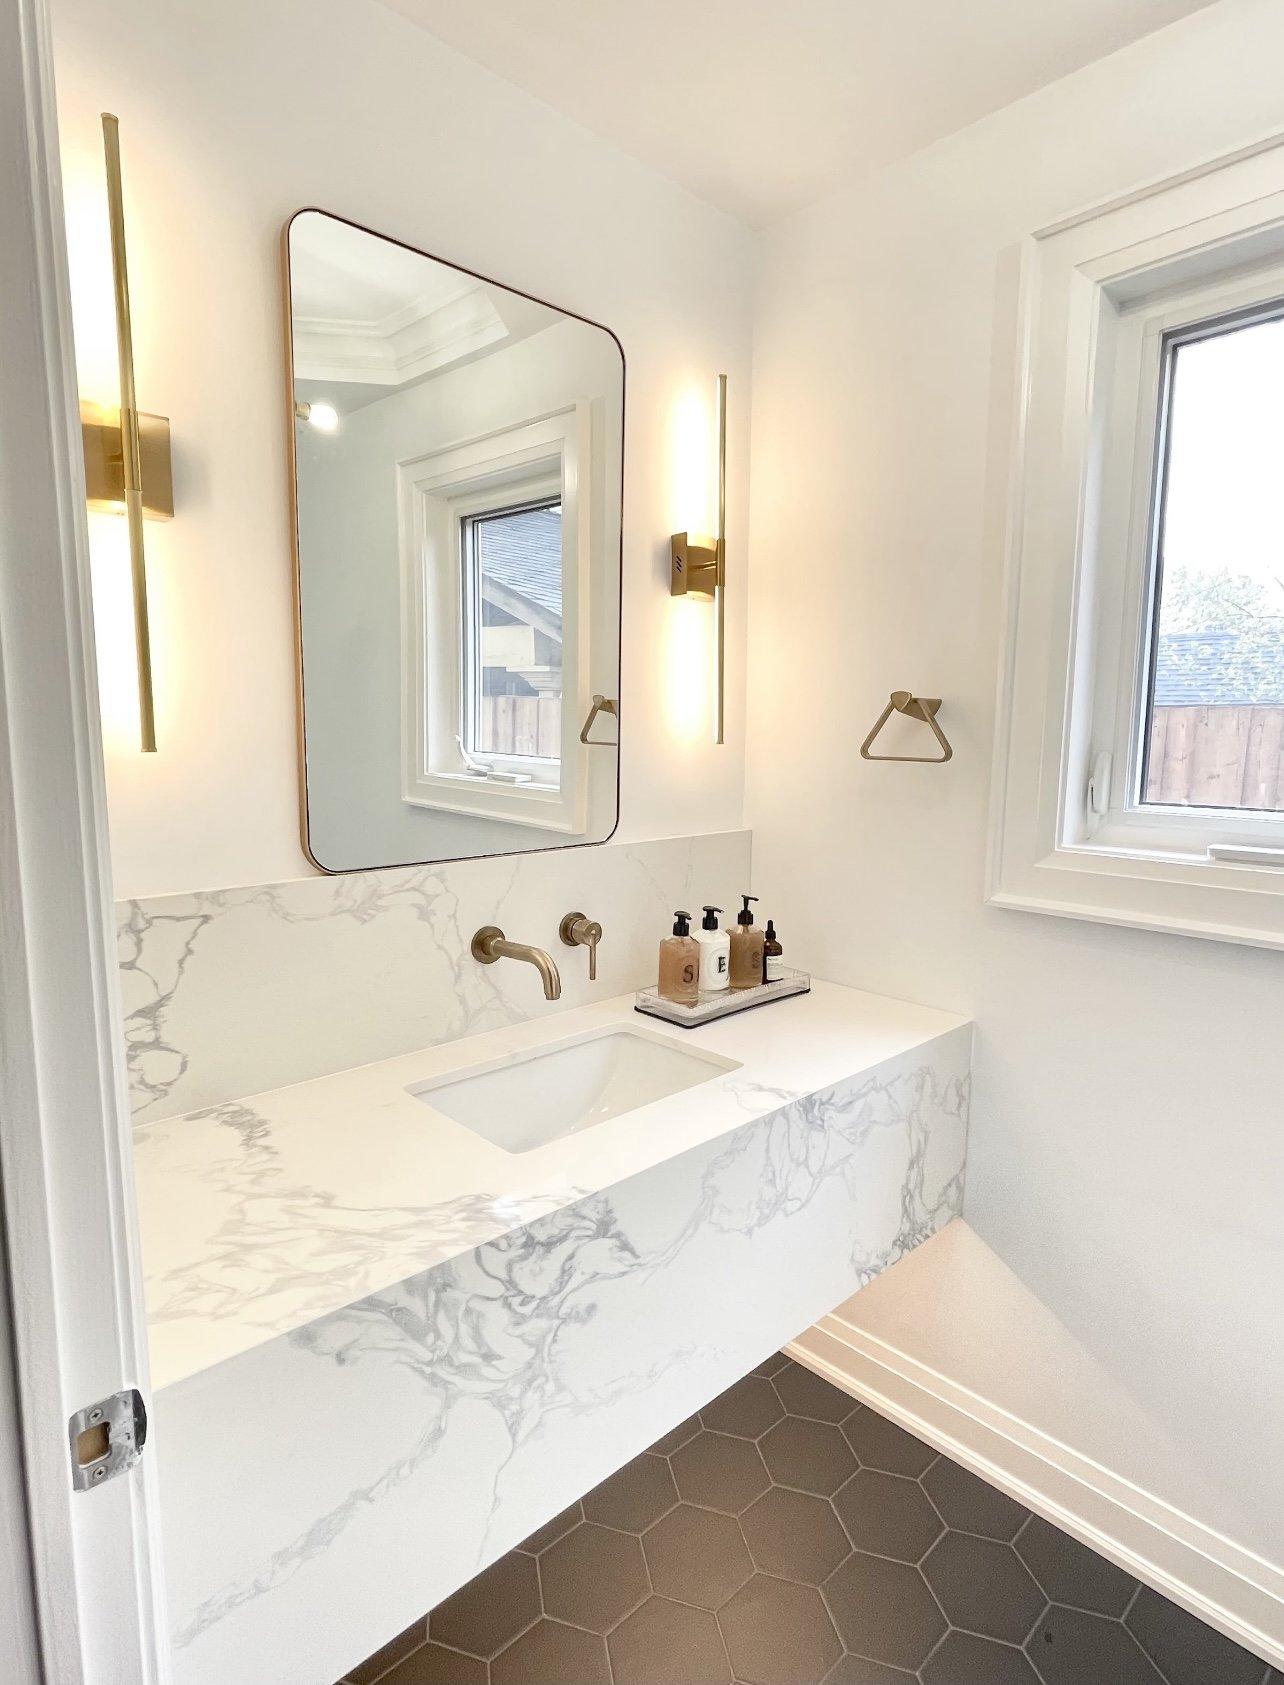 Imperial Granite & Stone Ltd. Bathroom Project